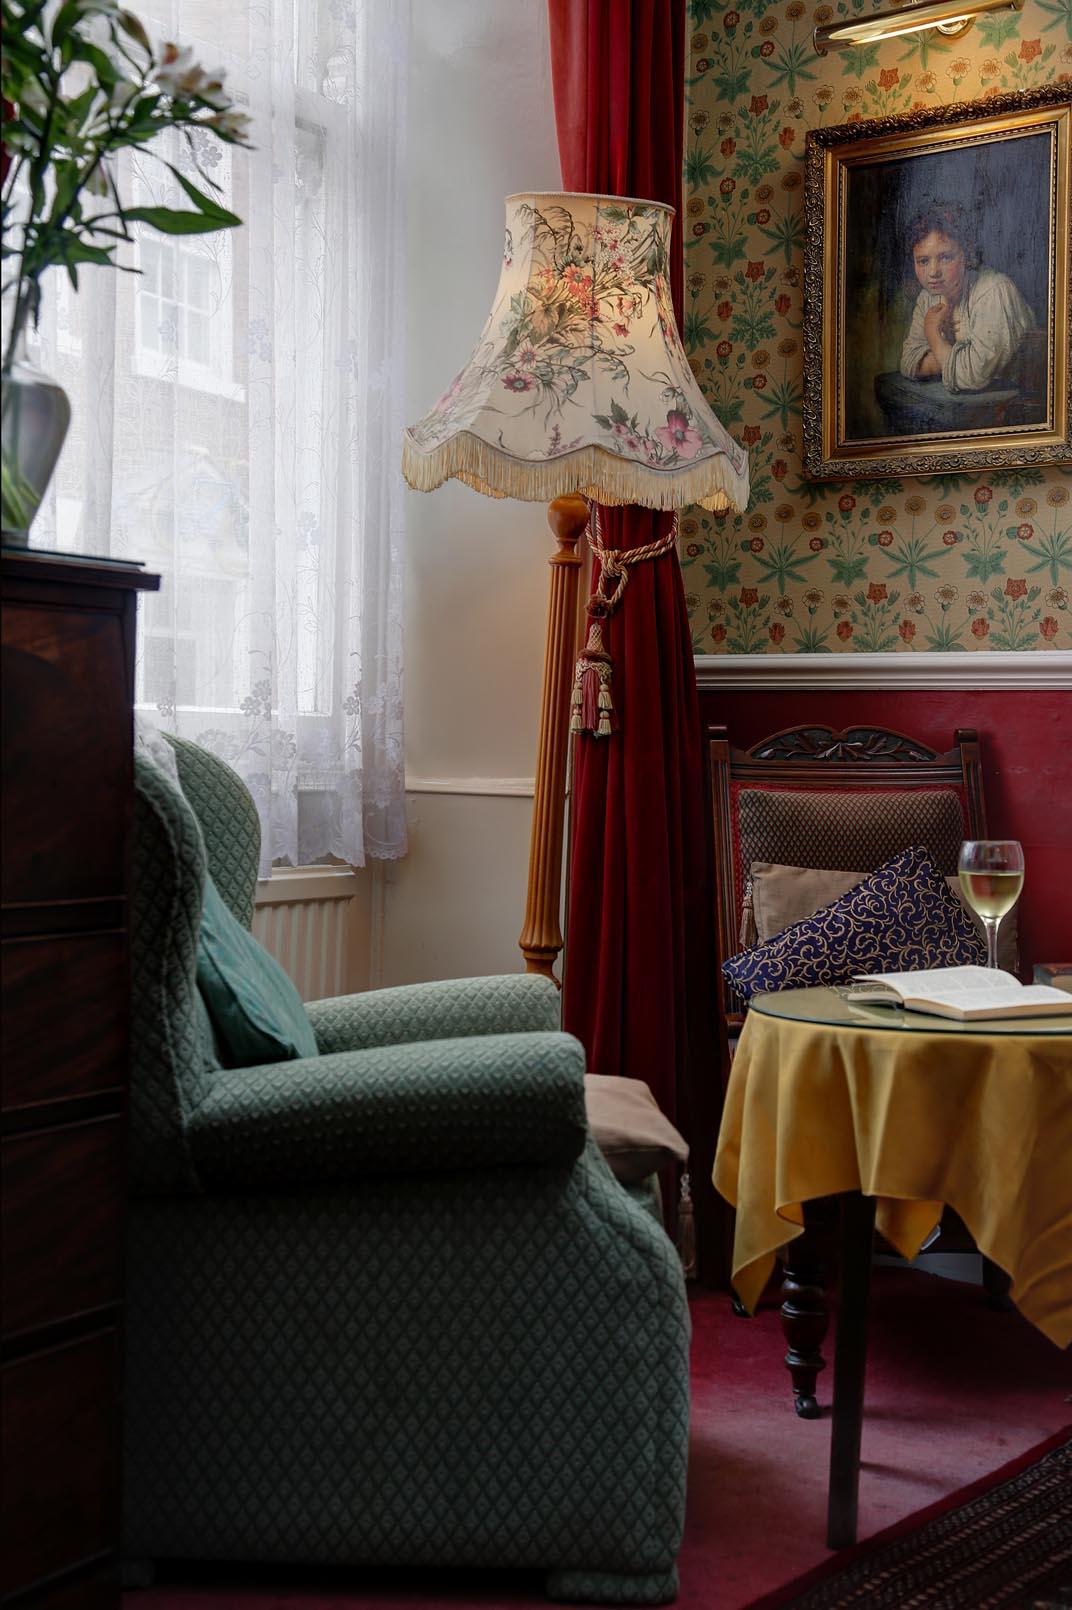 Best Western Hotel Room: Best Western Lairgate Hotel